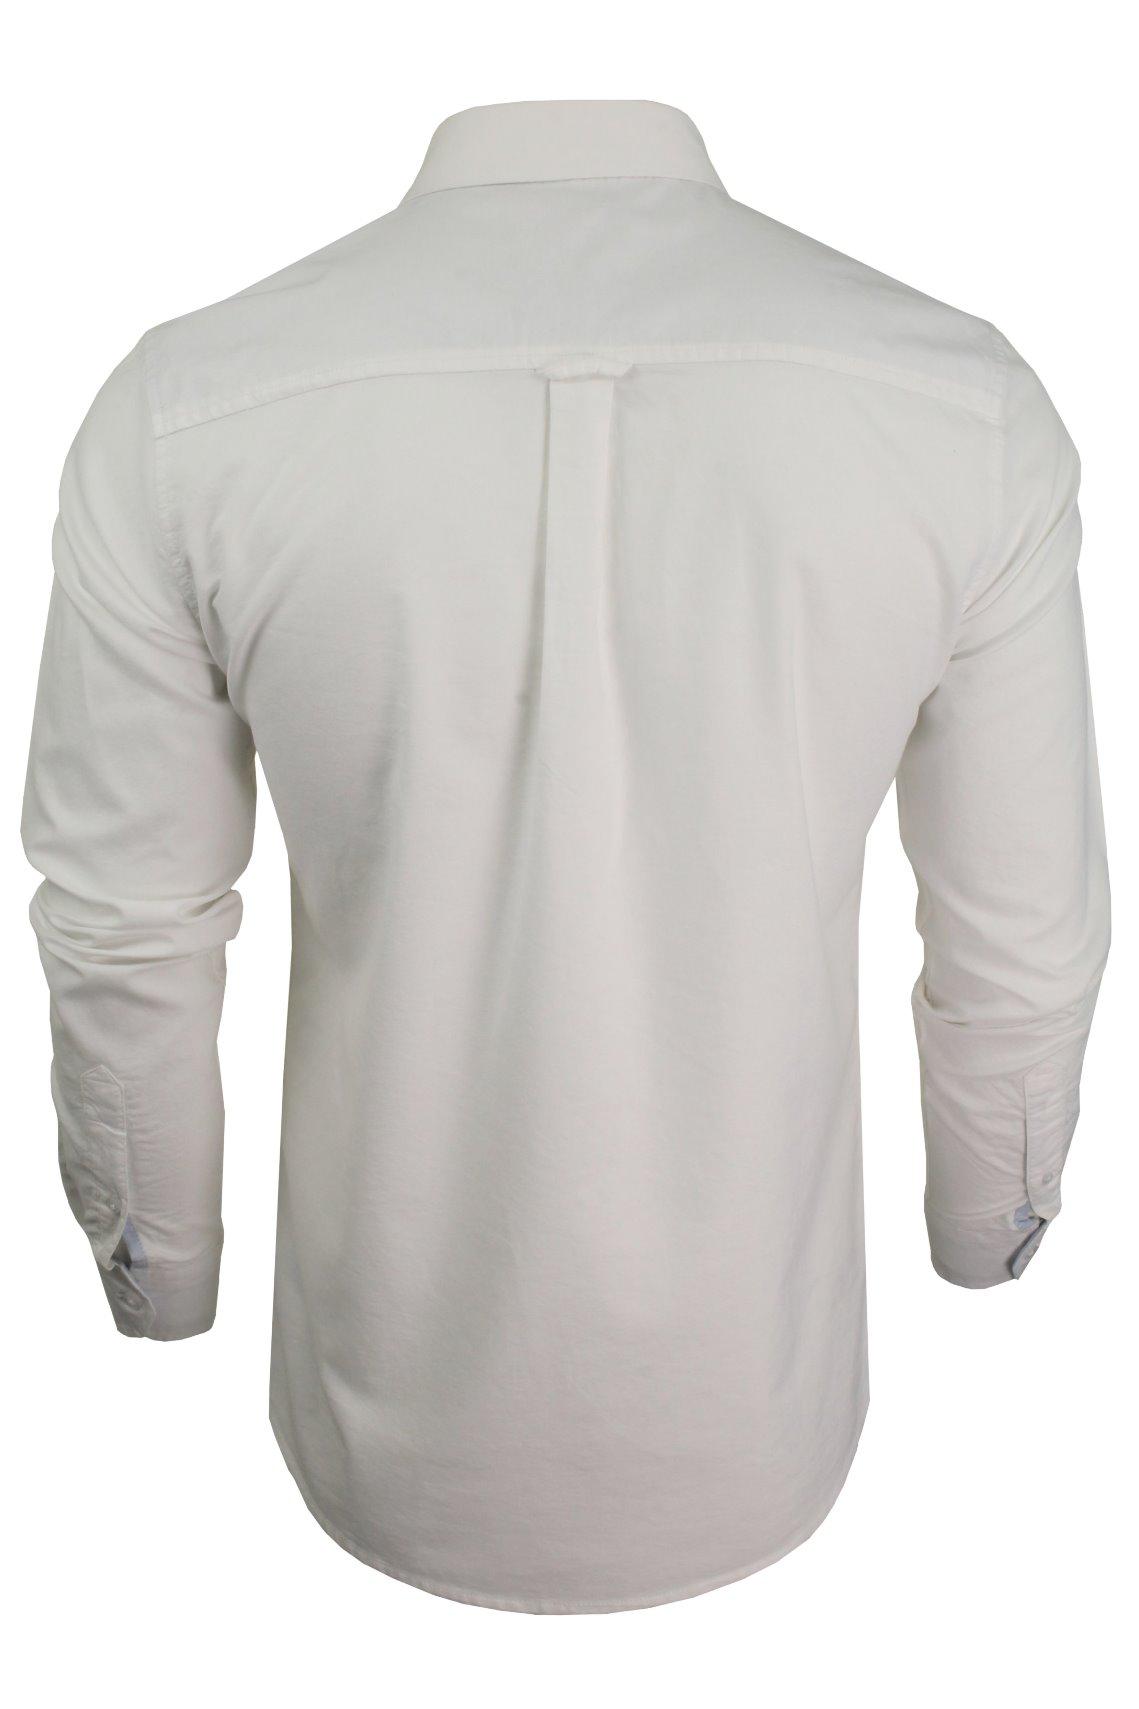 Xact-Long-Sleeved-Oxford-Shirt thumbnail 14